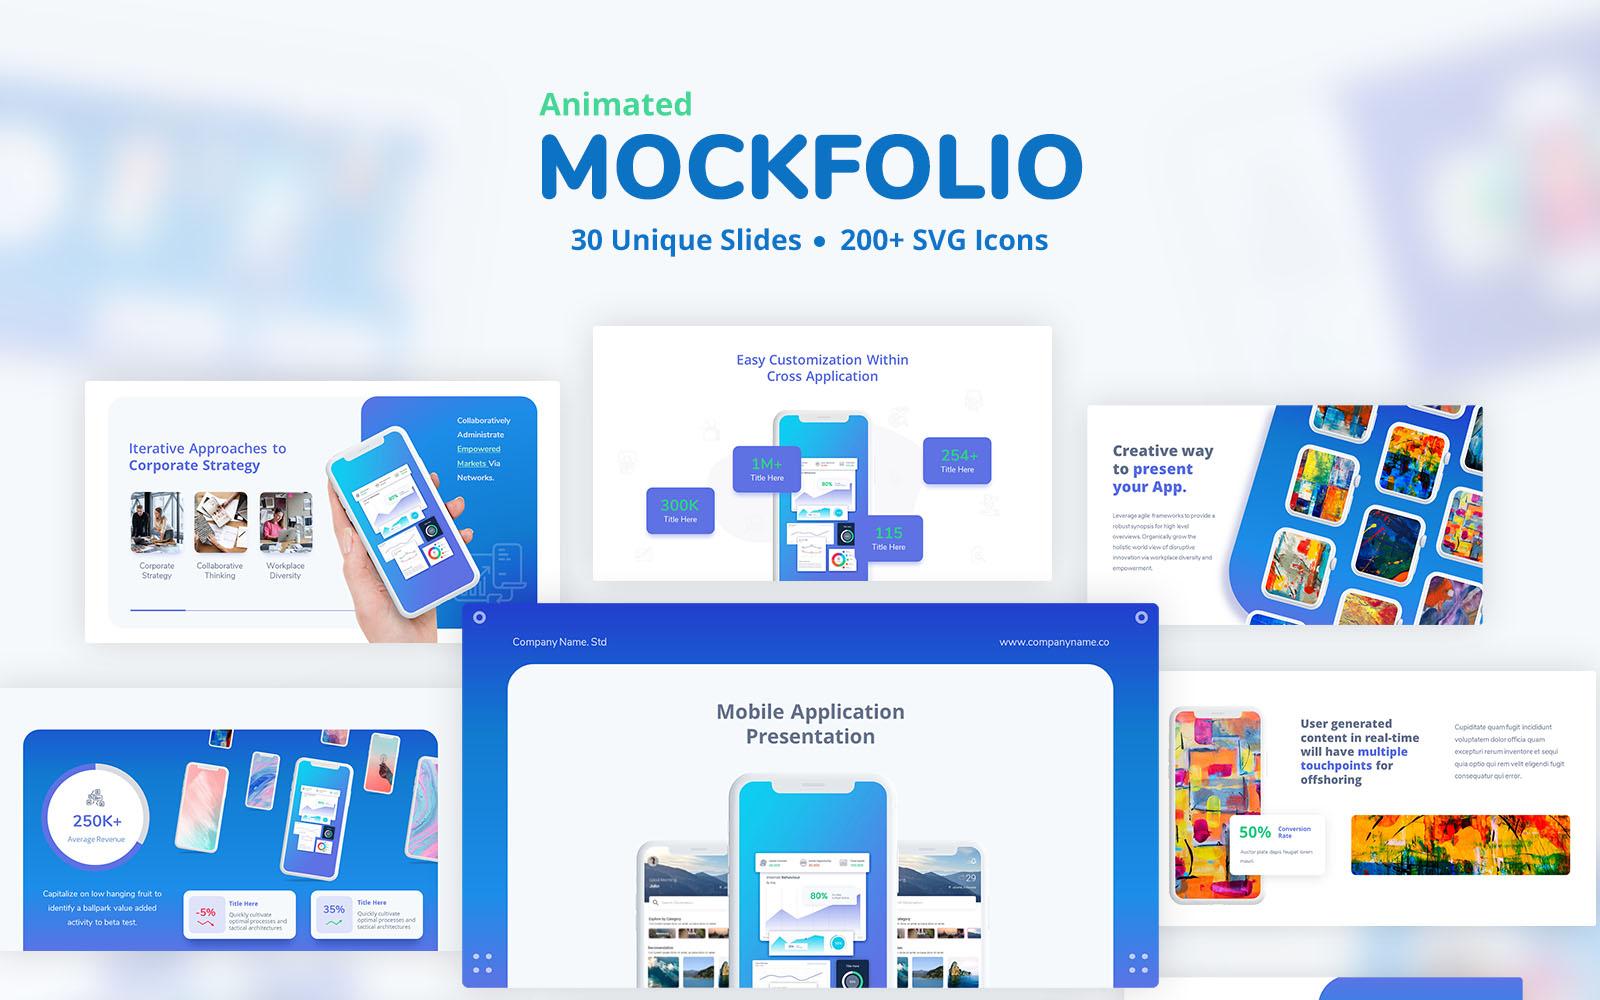 MockFolio - Animated Mockup Powerpoint Template